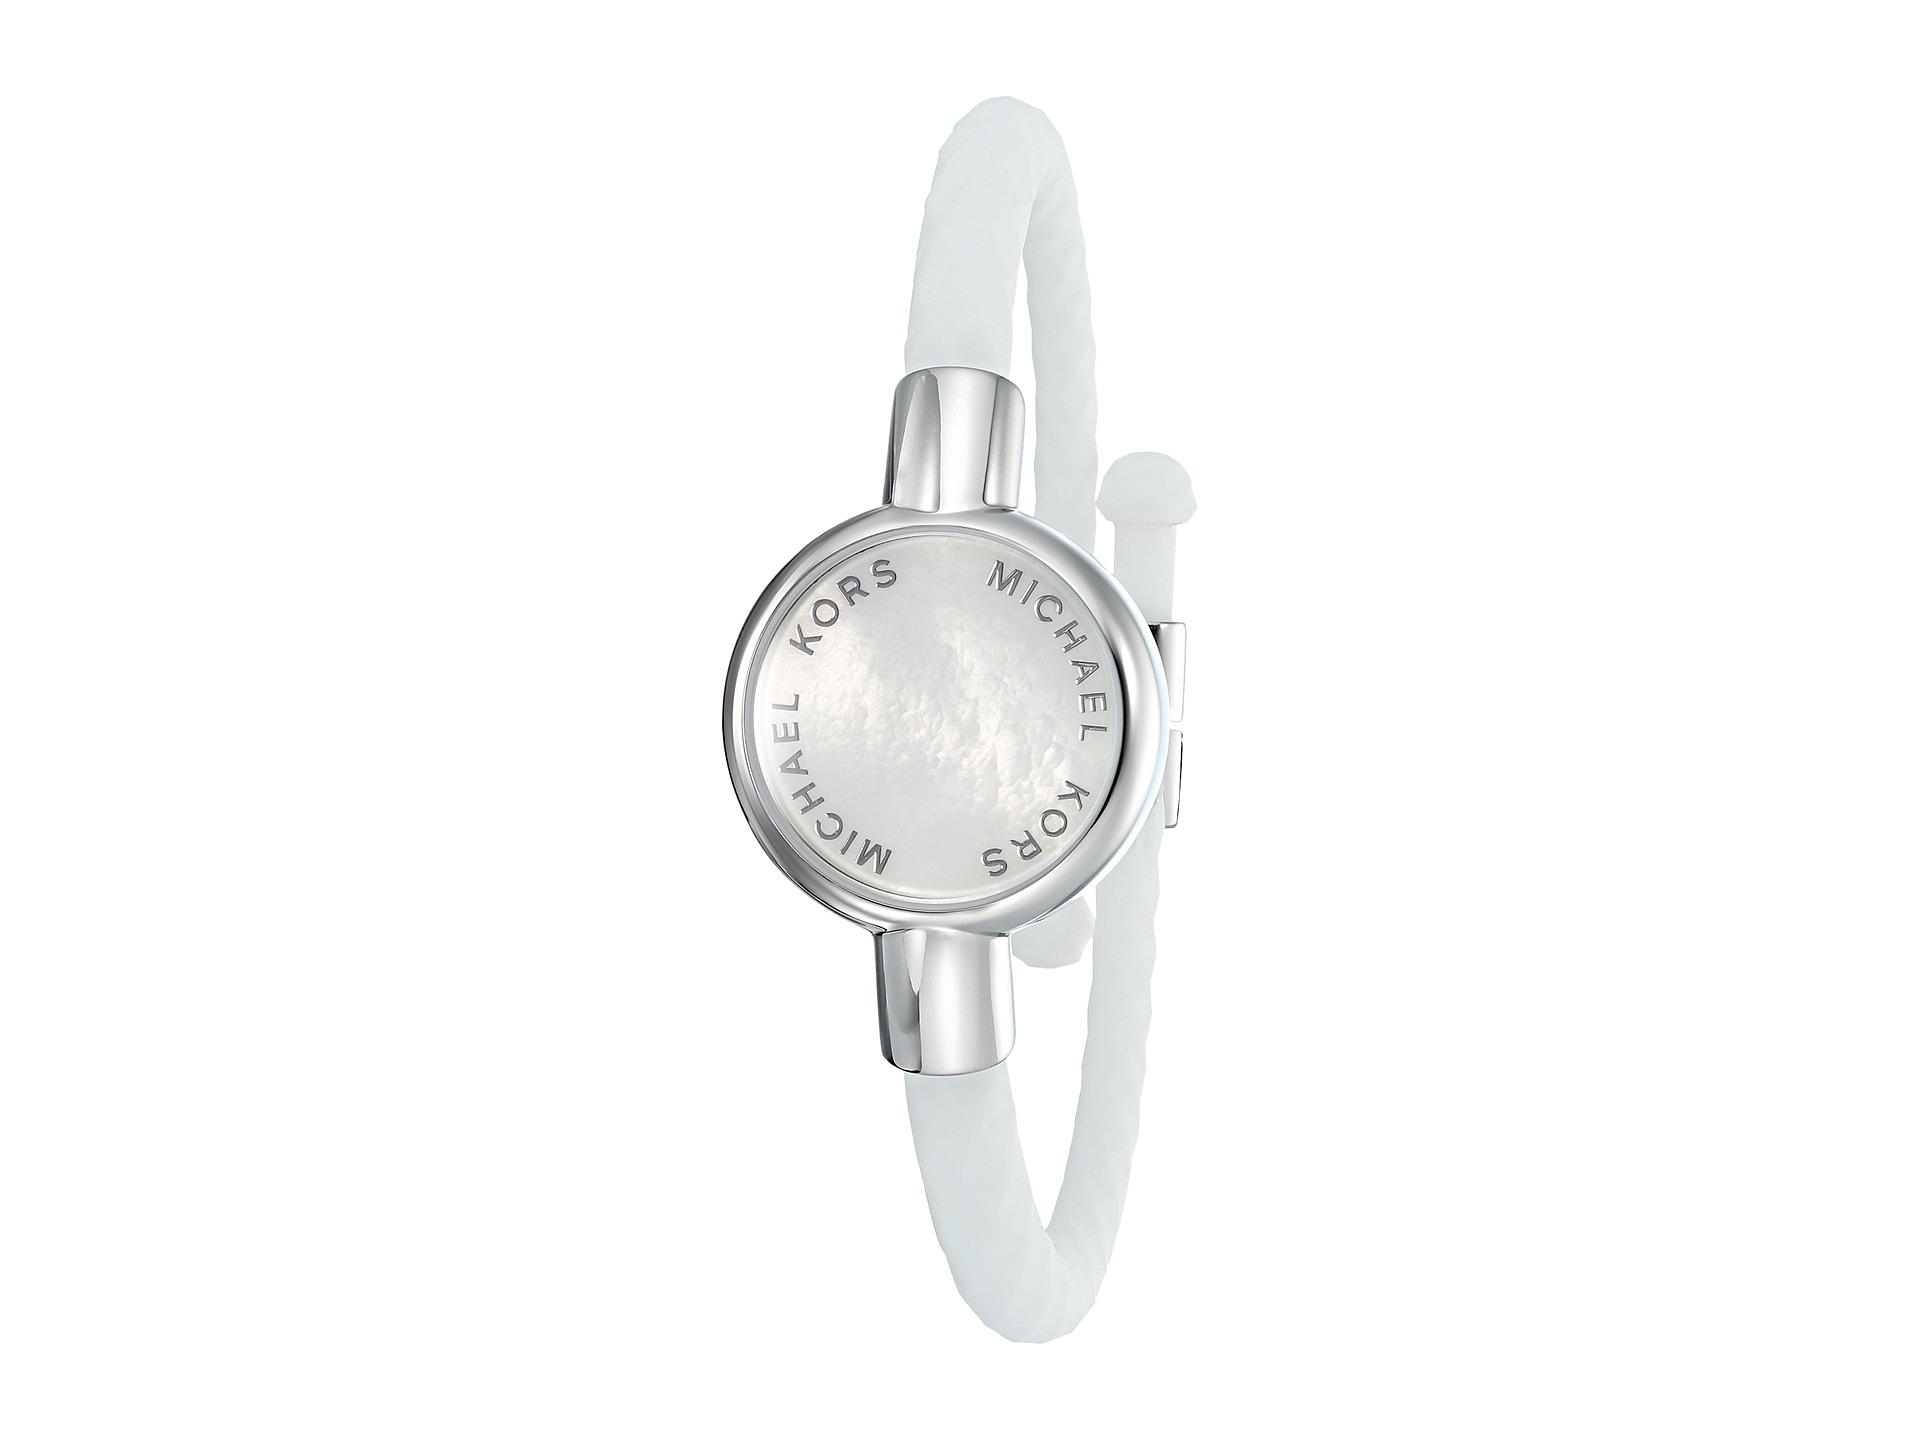 michael kors access silicone tracker bracelet silver. Black Bedroom Furniture Sets. Home Design Ideas